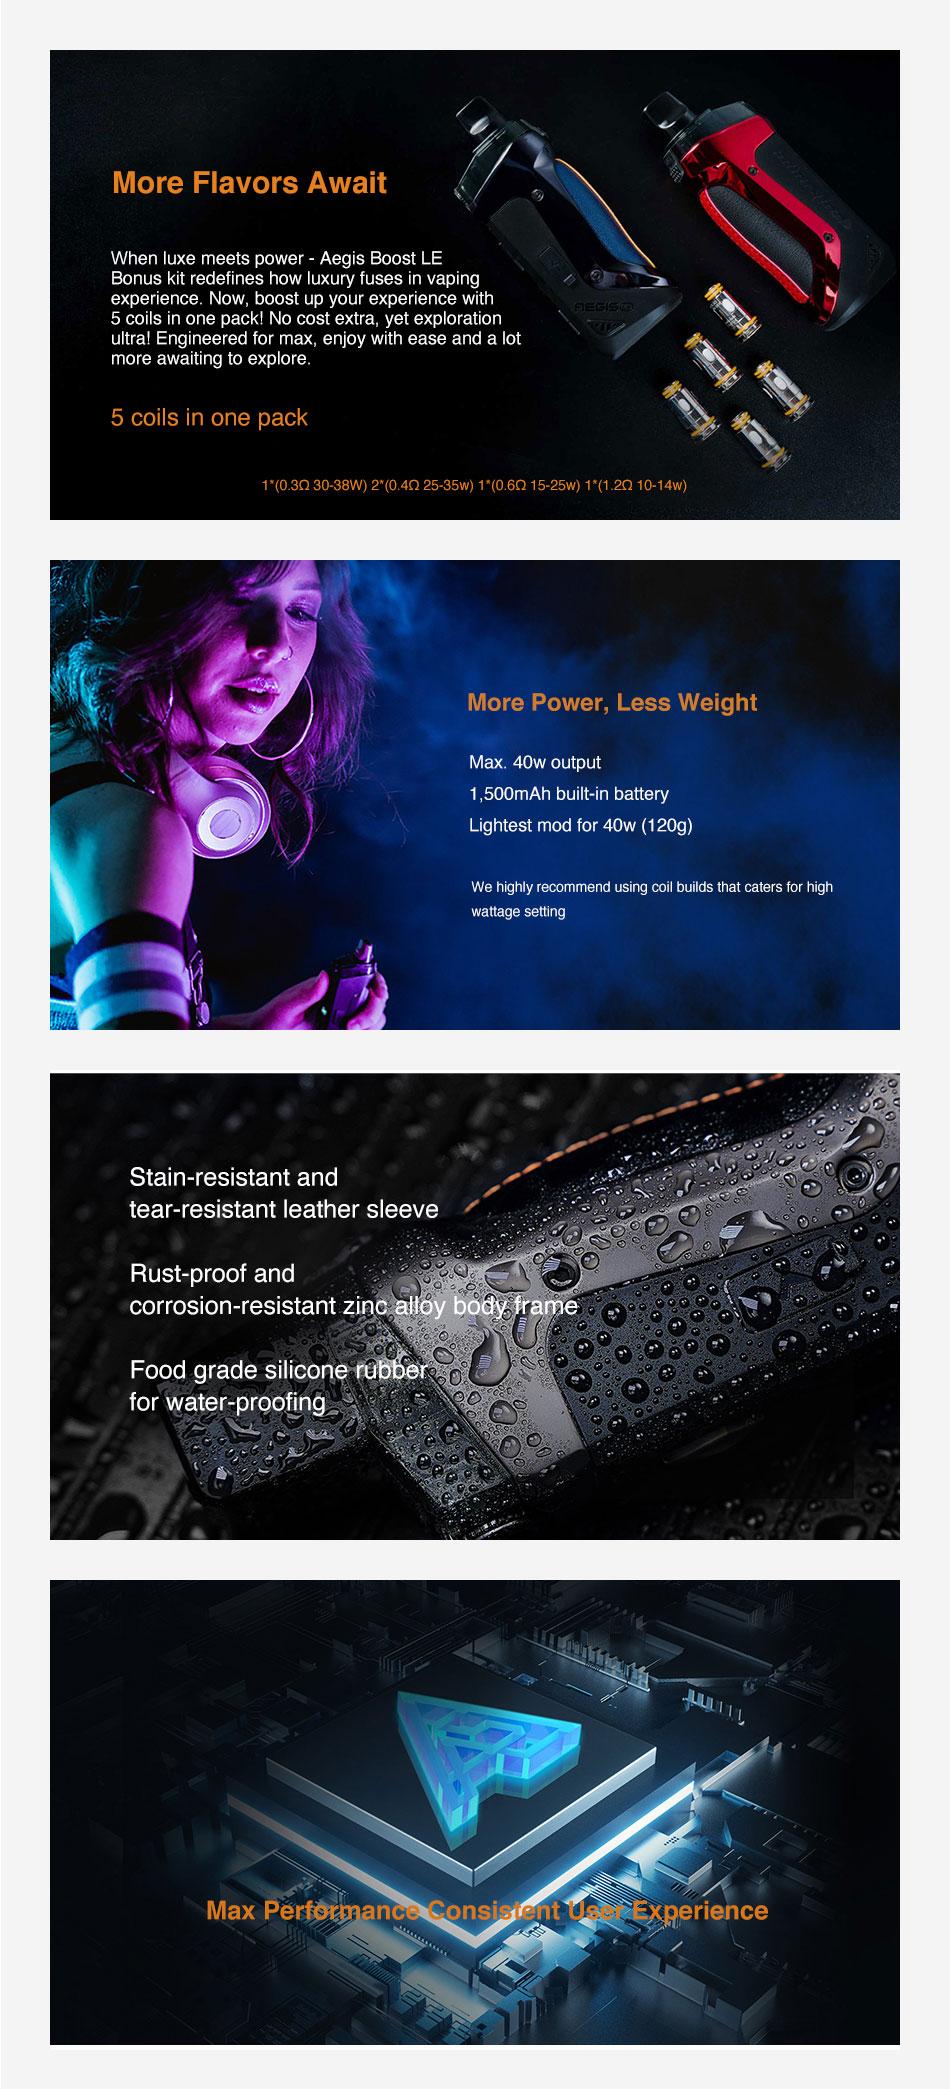 Geekvape-Aegis-Luxury-Edition-Bonus-40W-Pod-Mod-Kit-1500mAh-Online-in-Pakistan-at-Vapestation